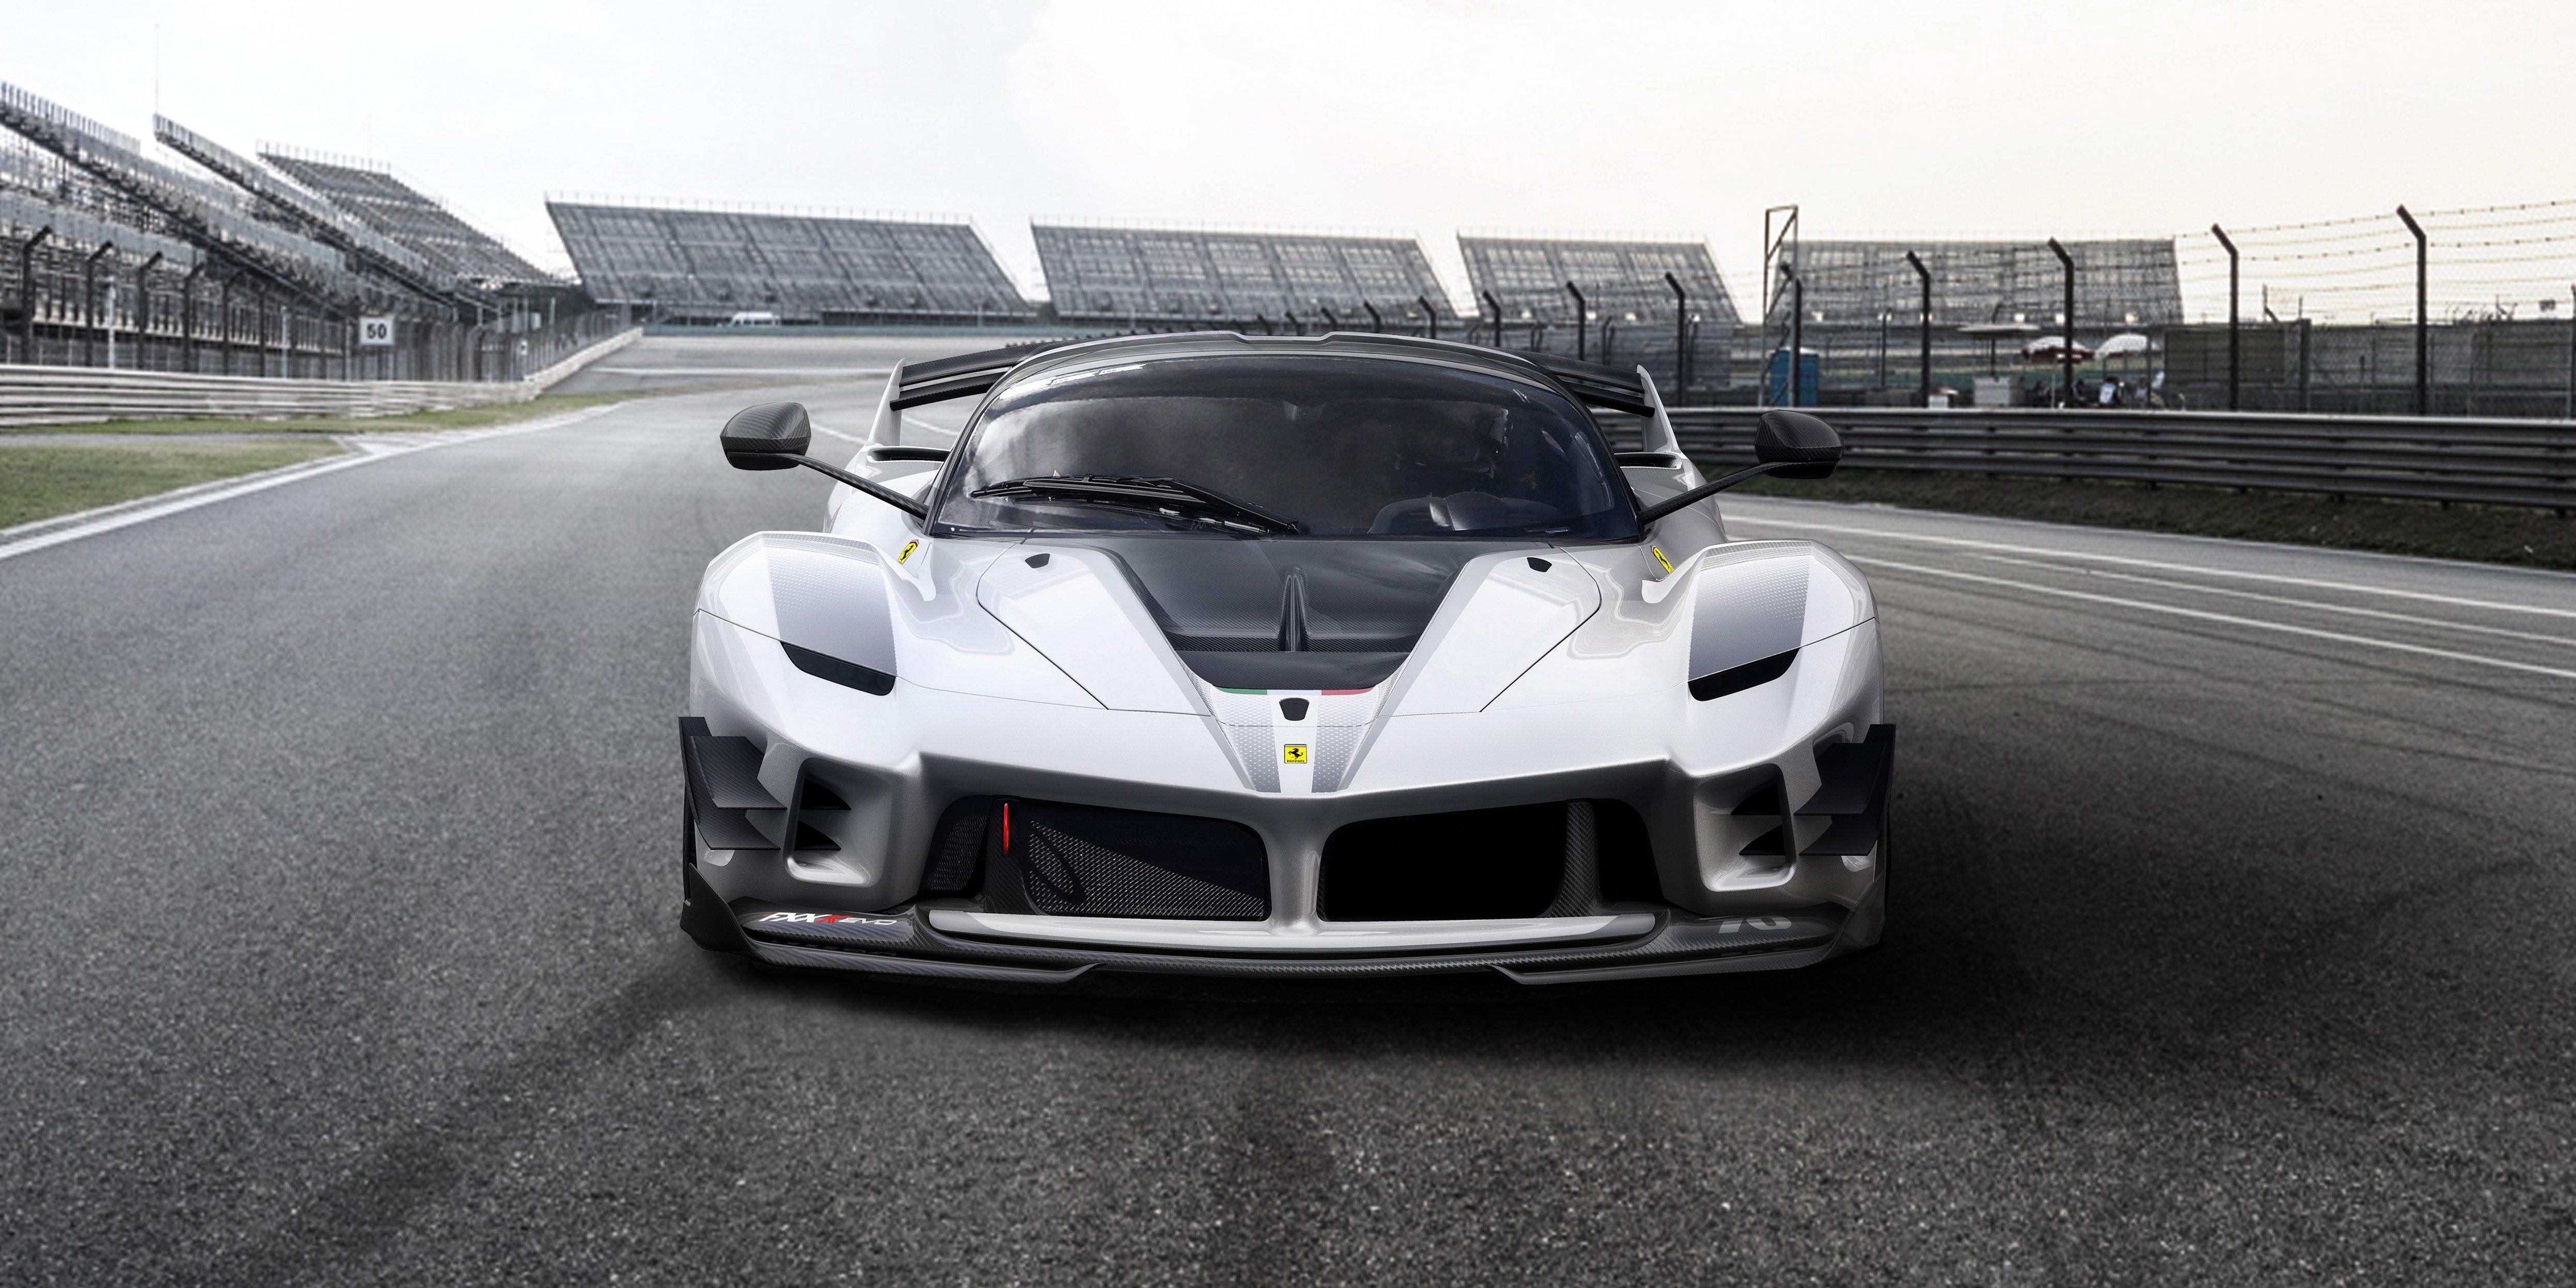 2018 Mitsubishi Gto >> Ferrari FXX-K Evo revealed - Photos (1 of 6)